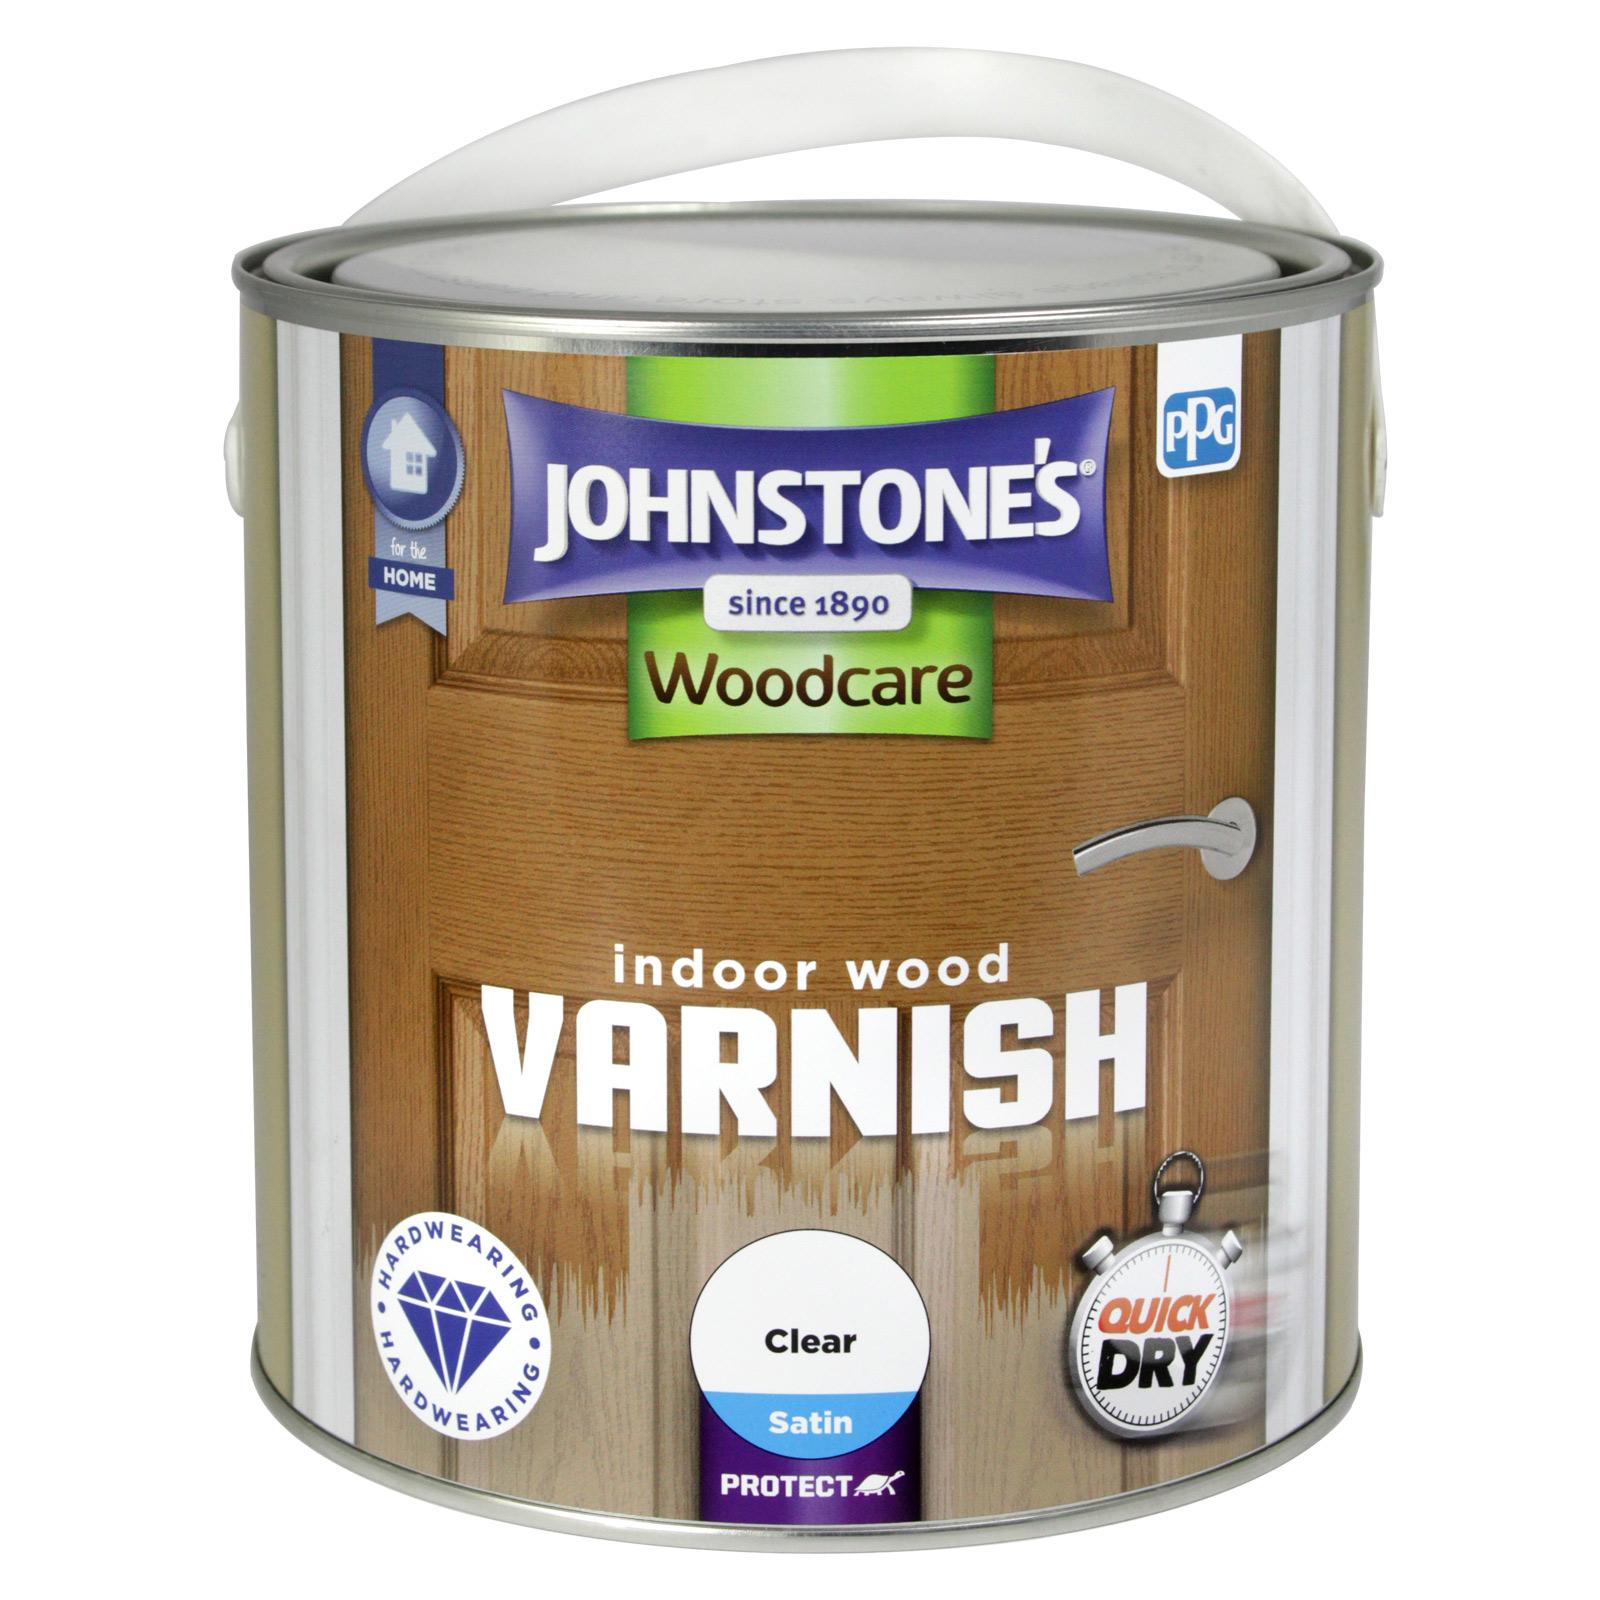 INDOOR VARNISH 2.5L SATIN CLEAR